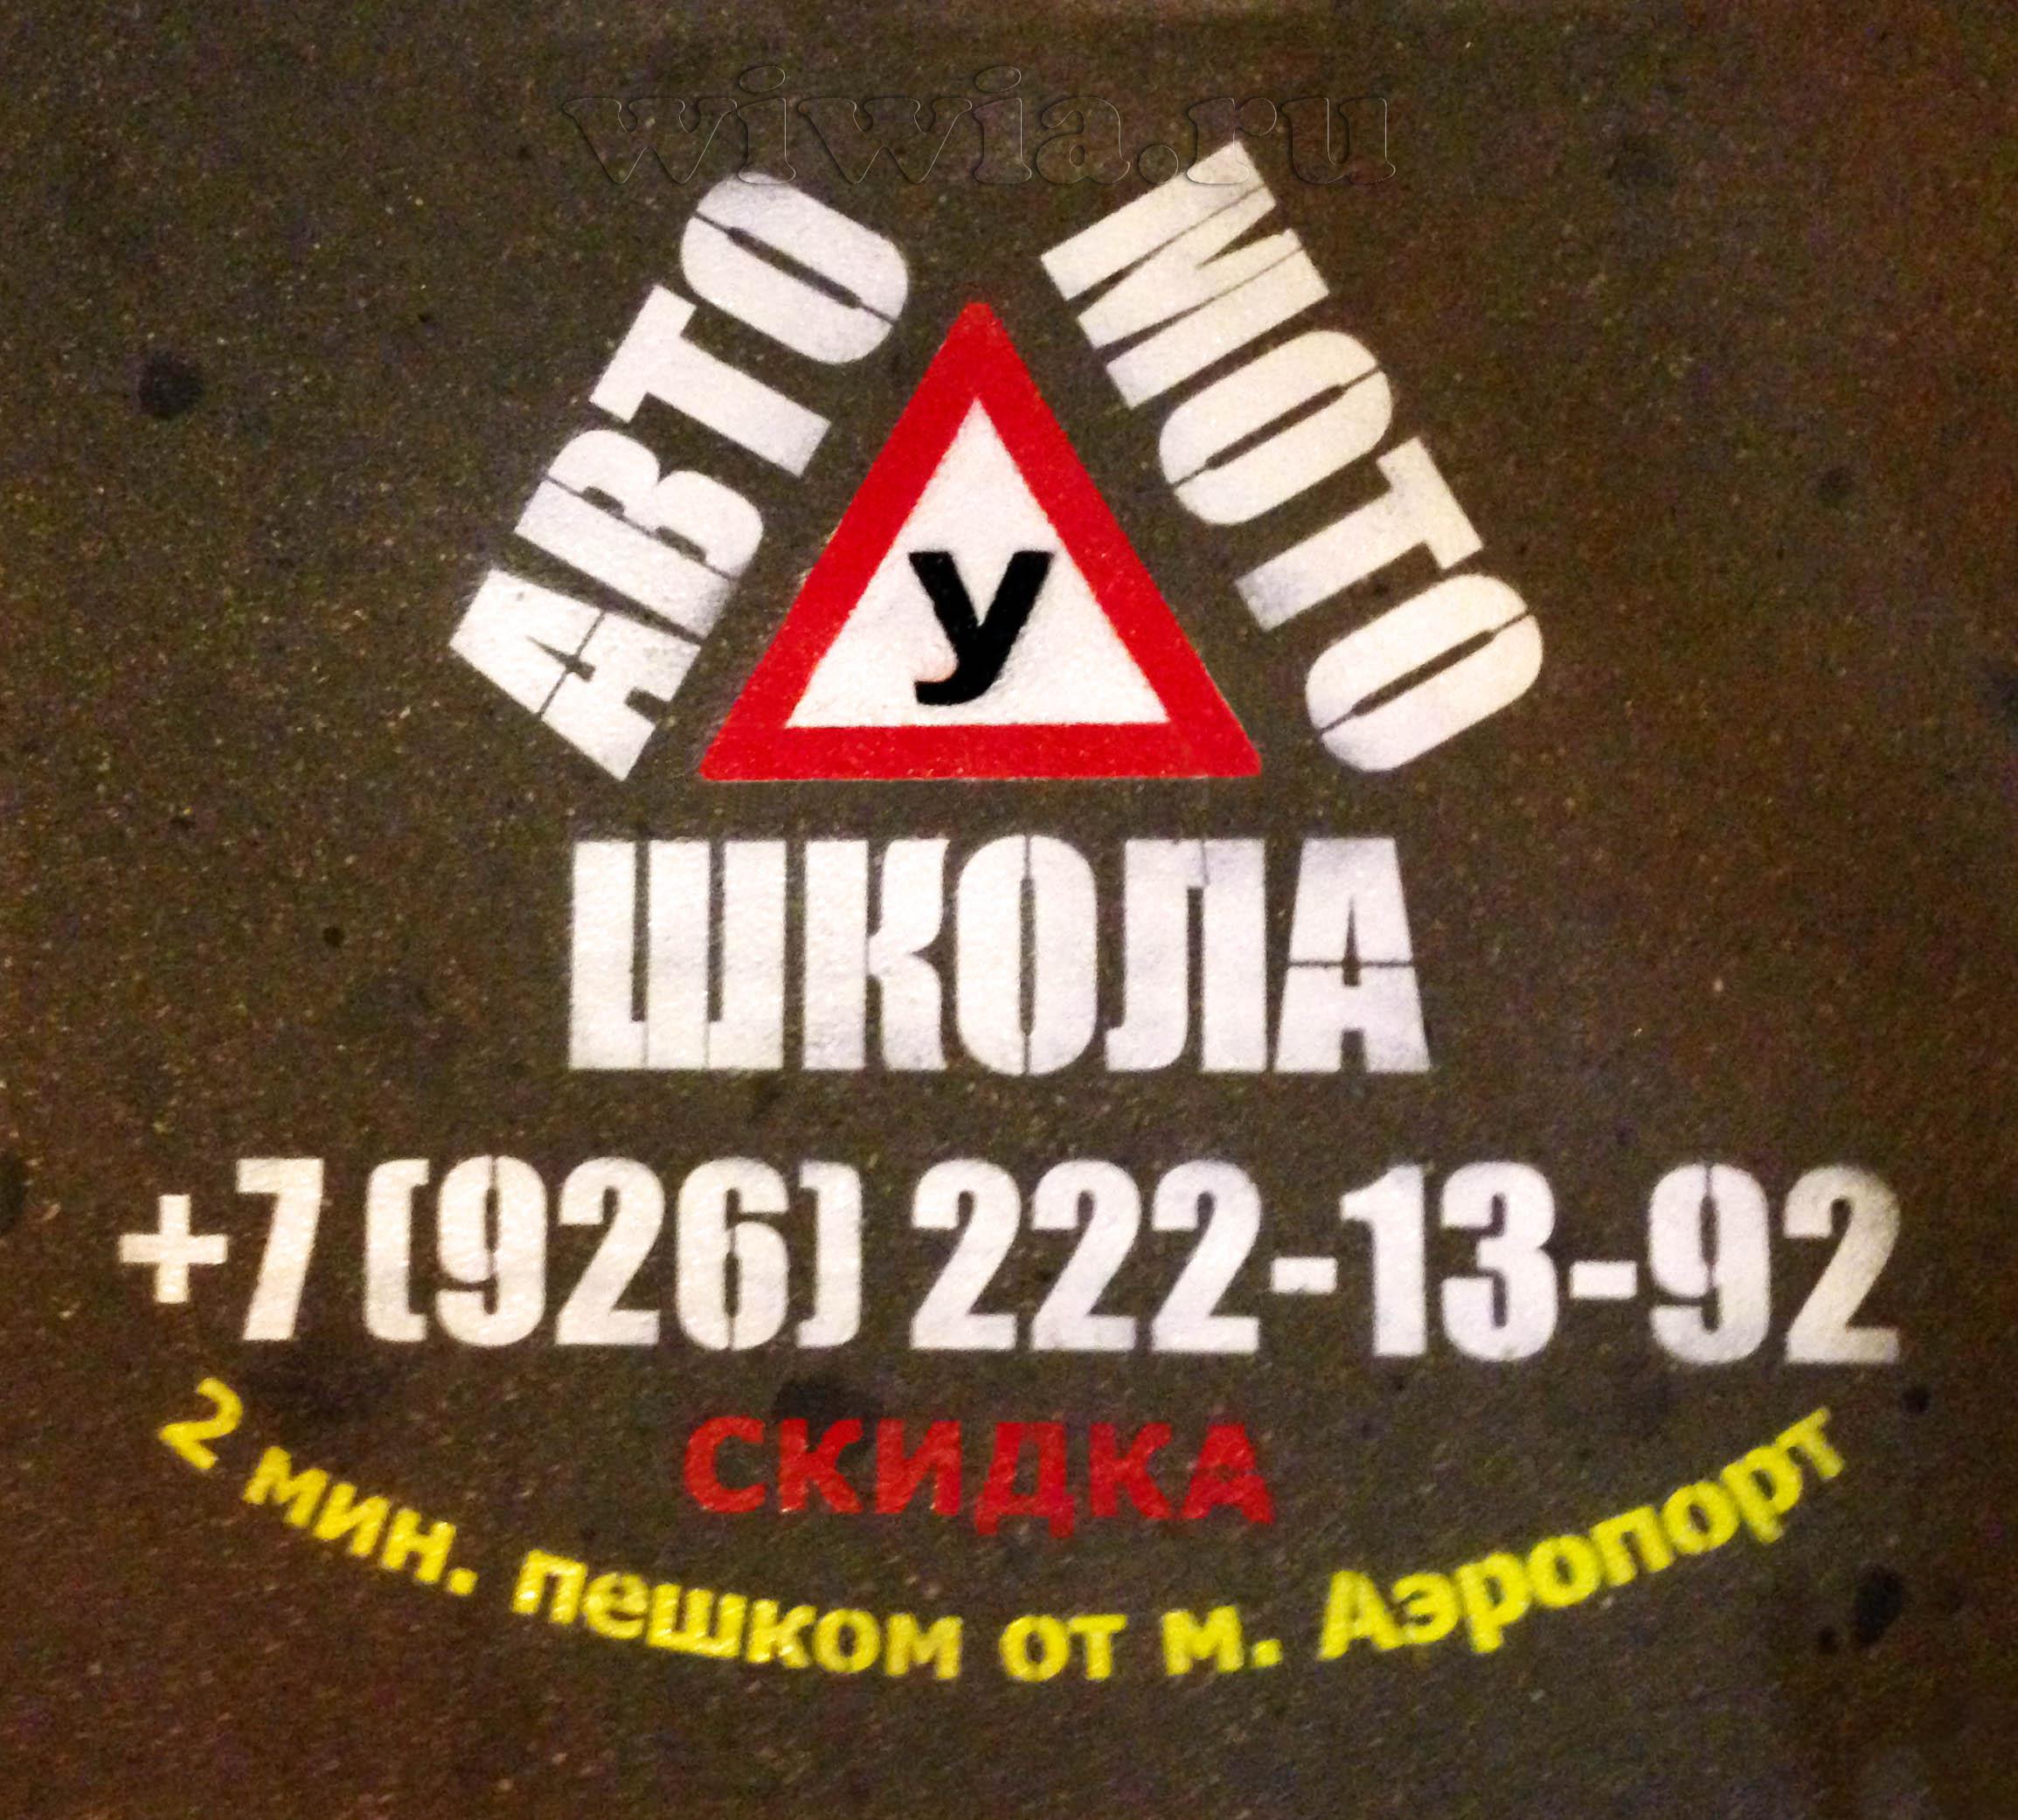 Реклама на асфальте для автошколы.